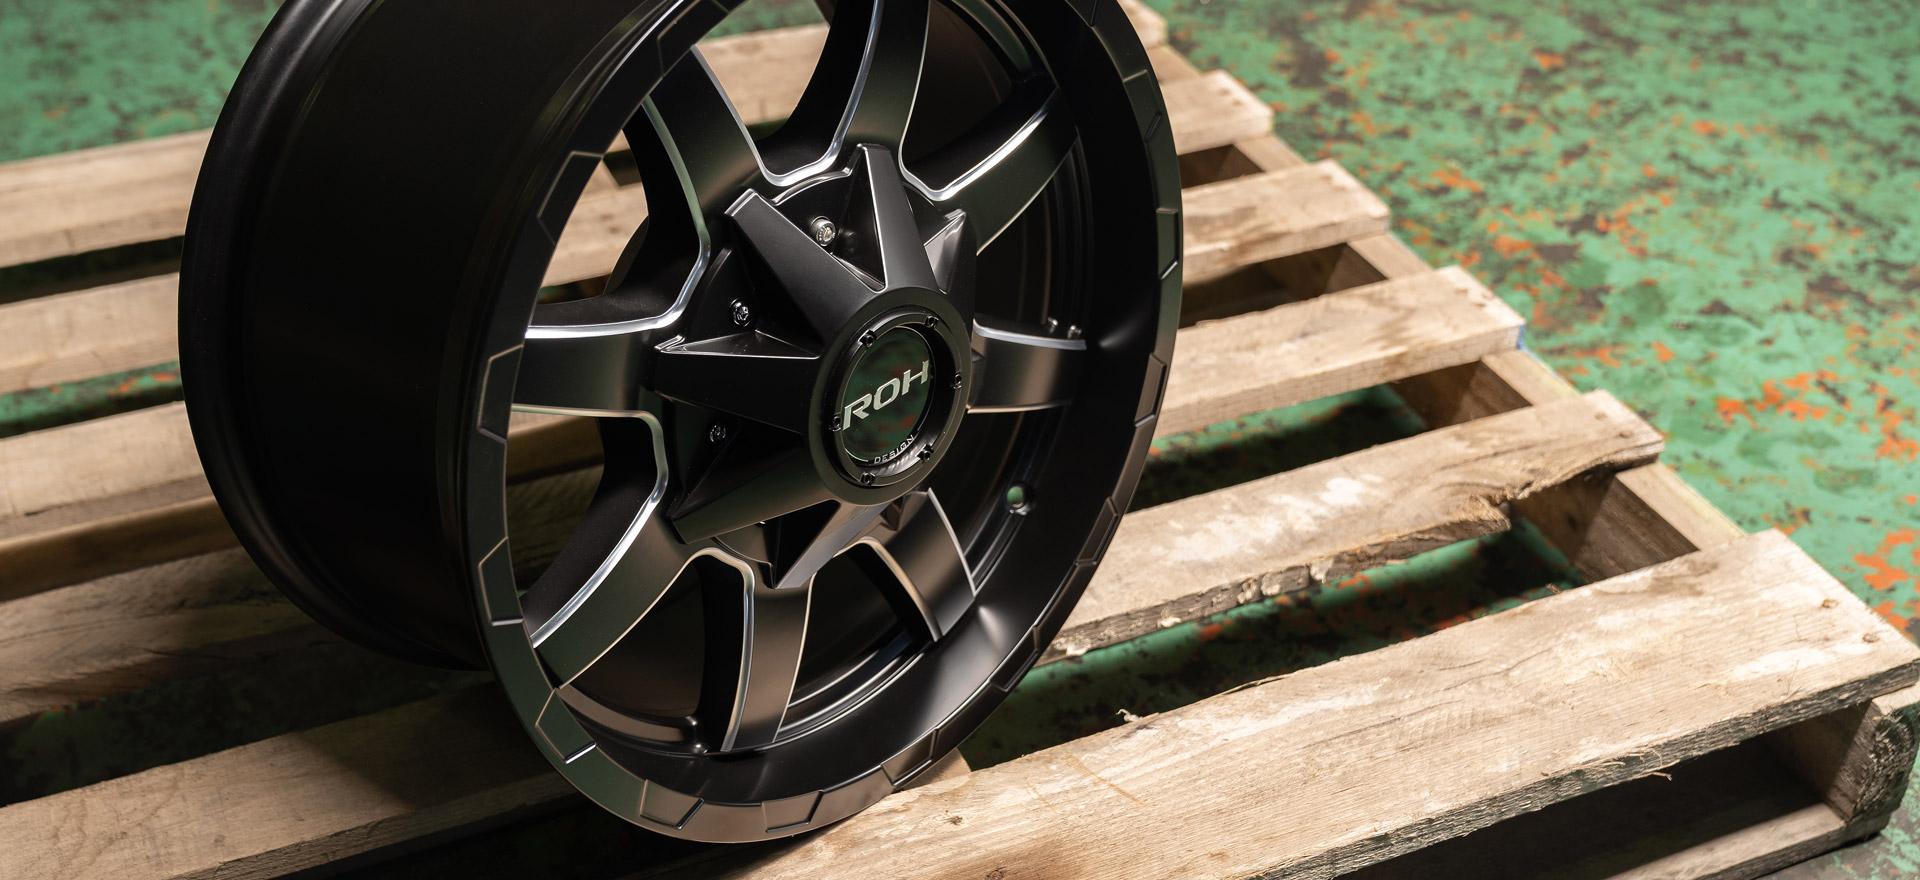 ROH Rhino alloy wheel on pallet